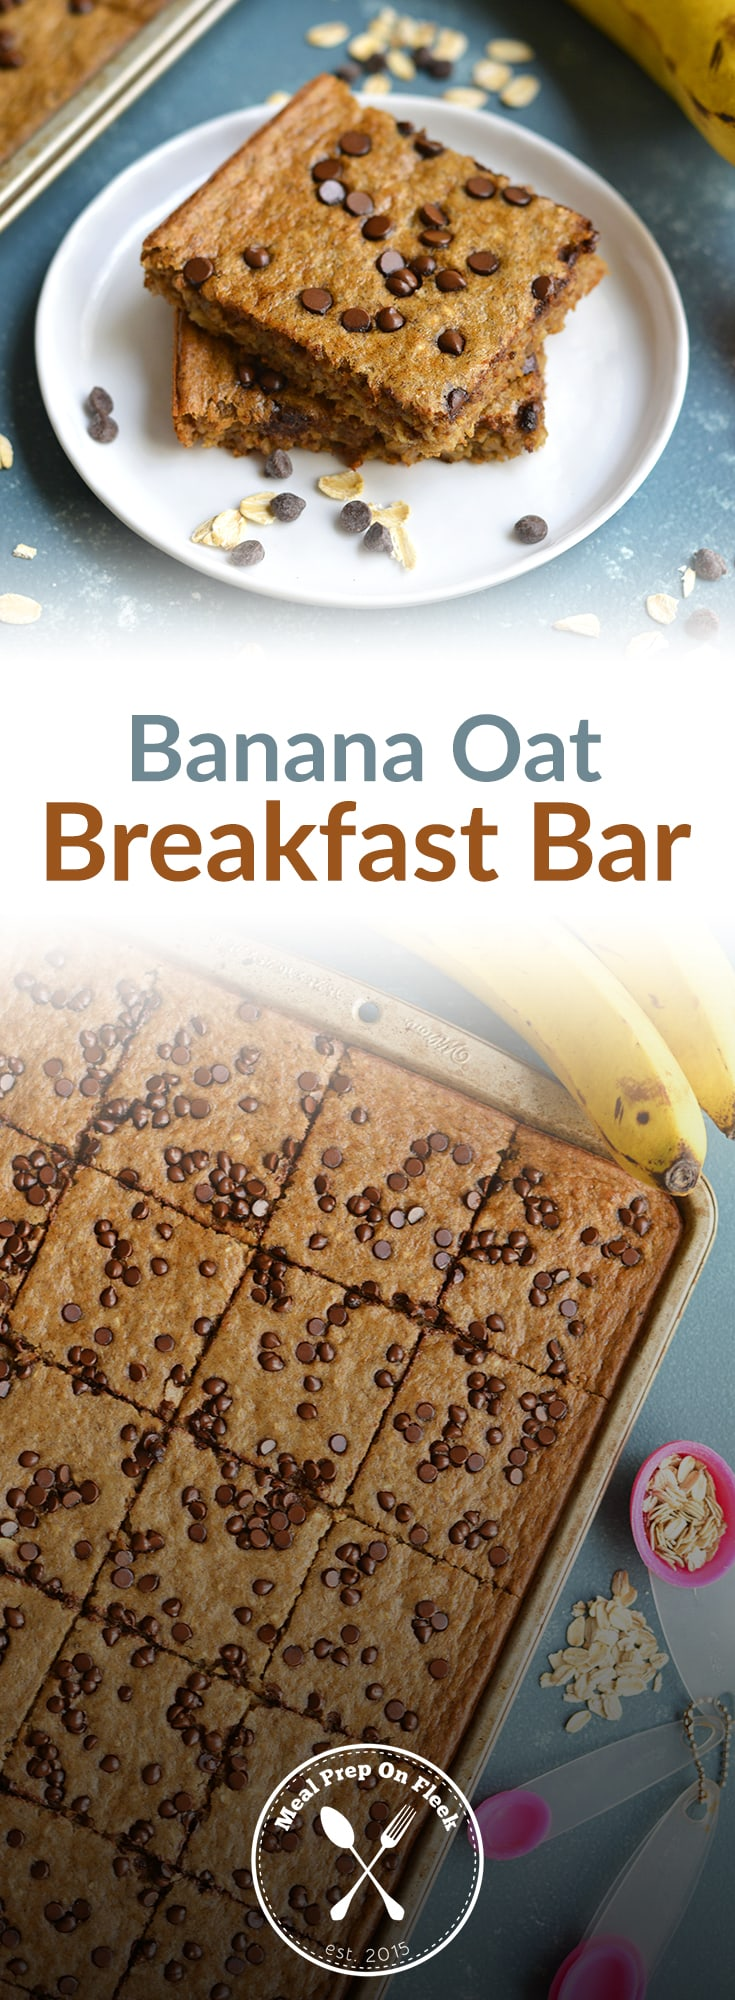 Banana Oat Breakfast Bar